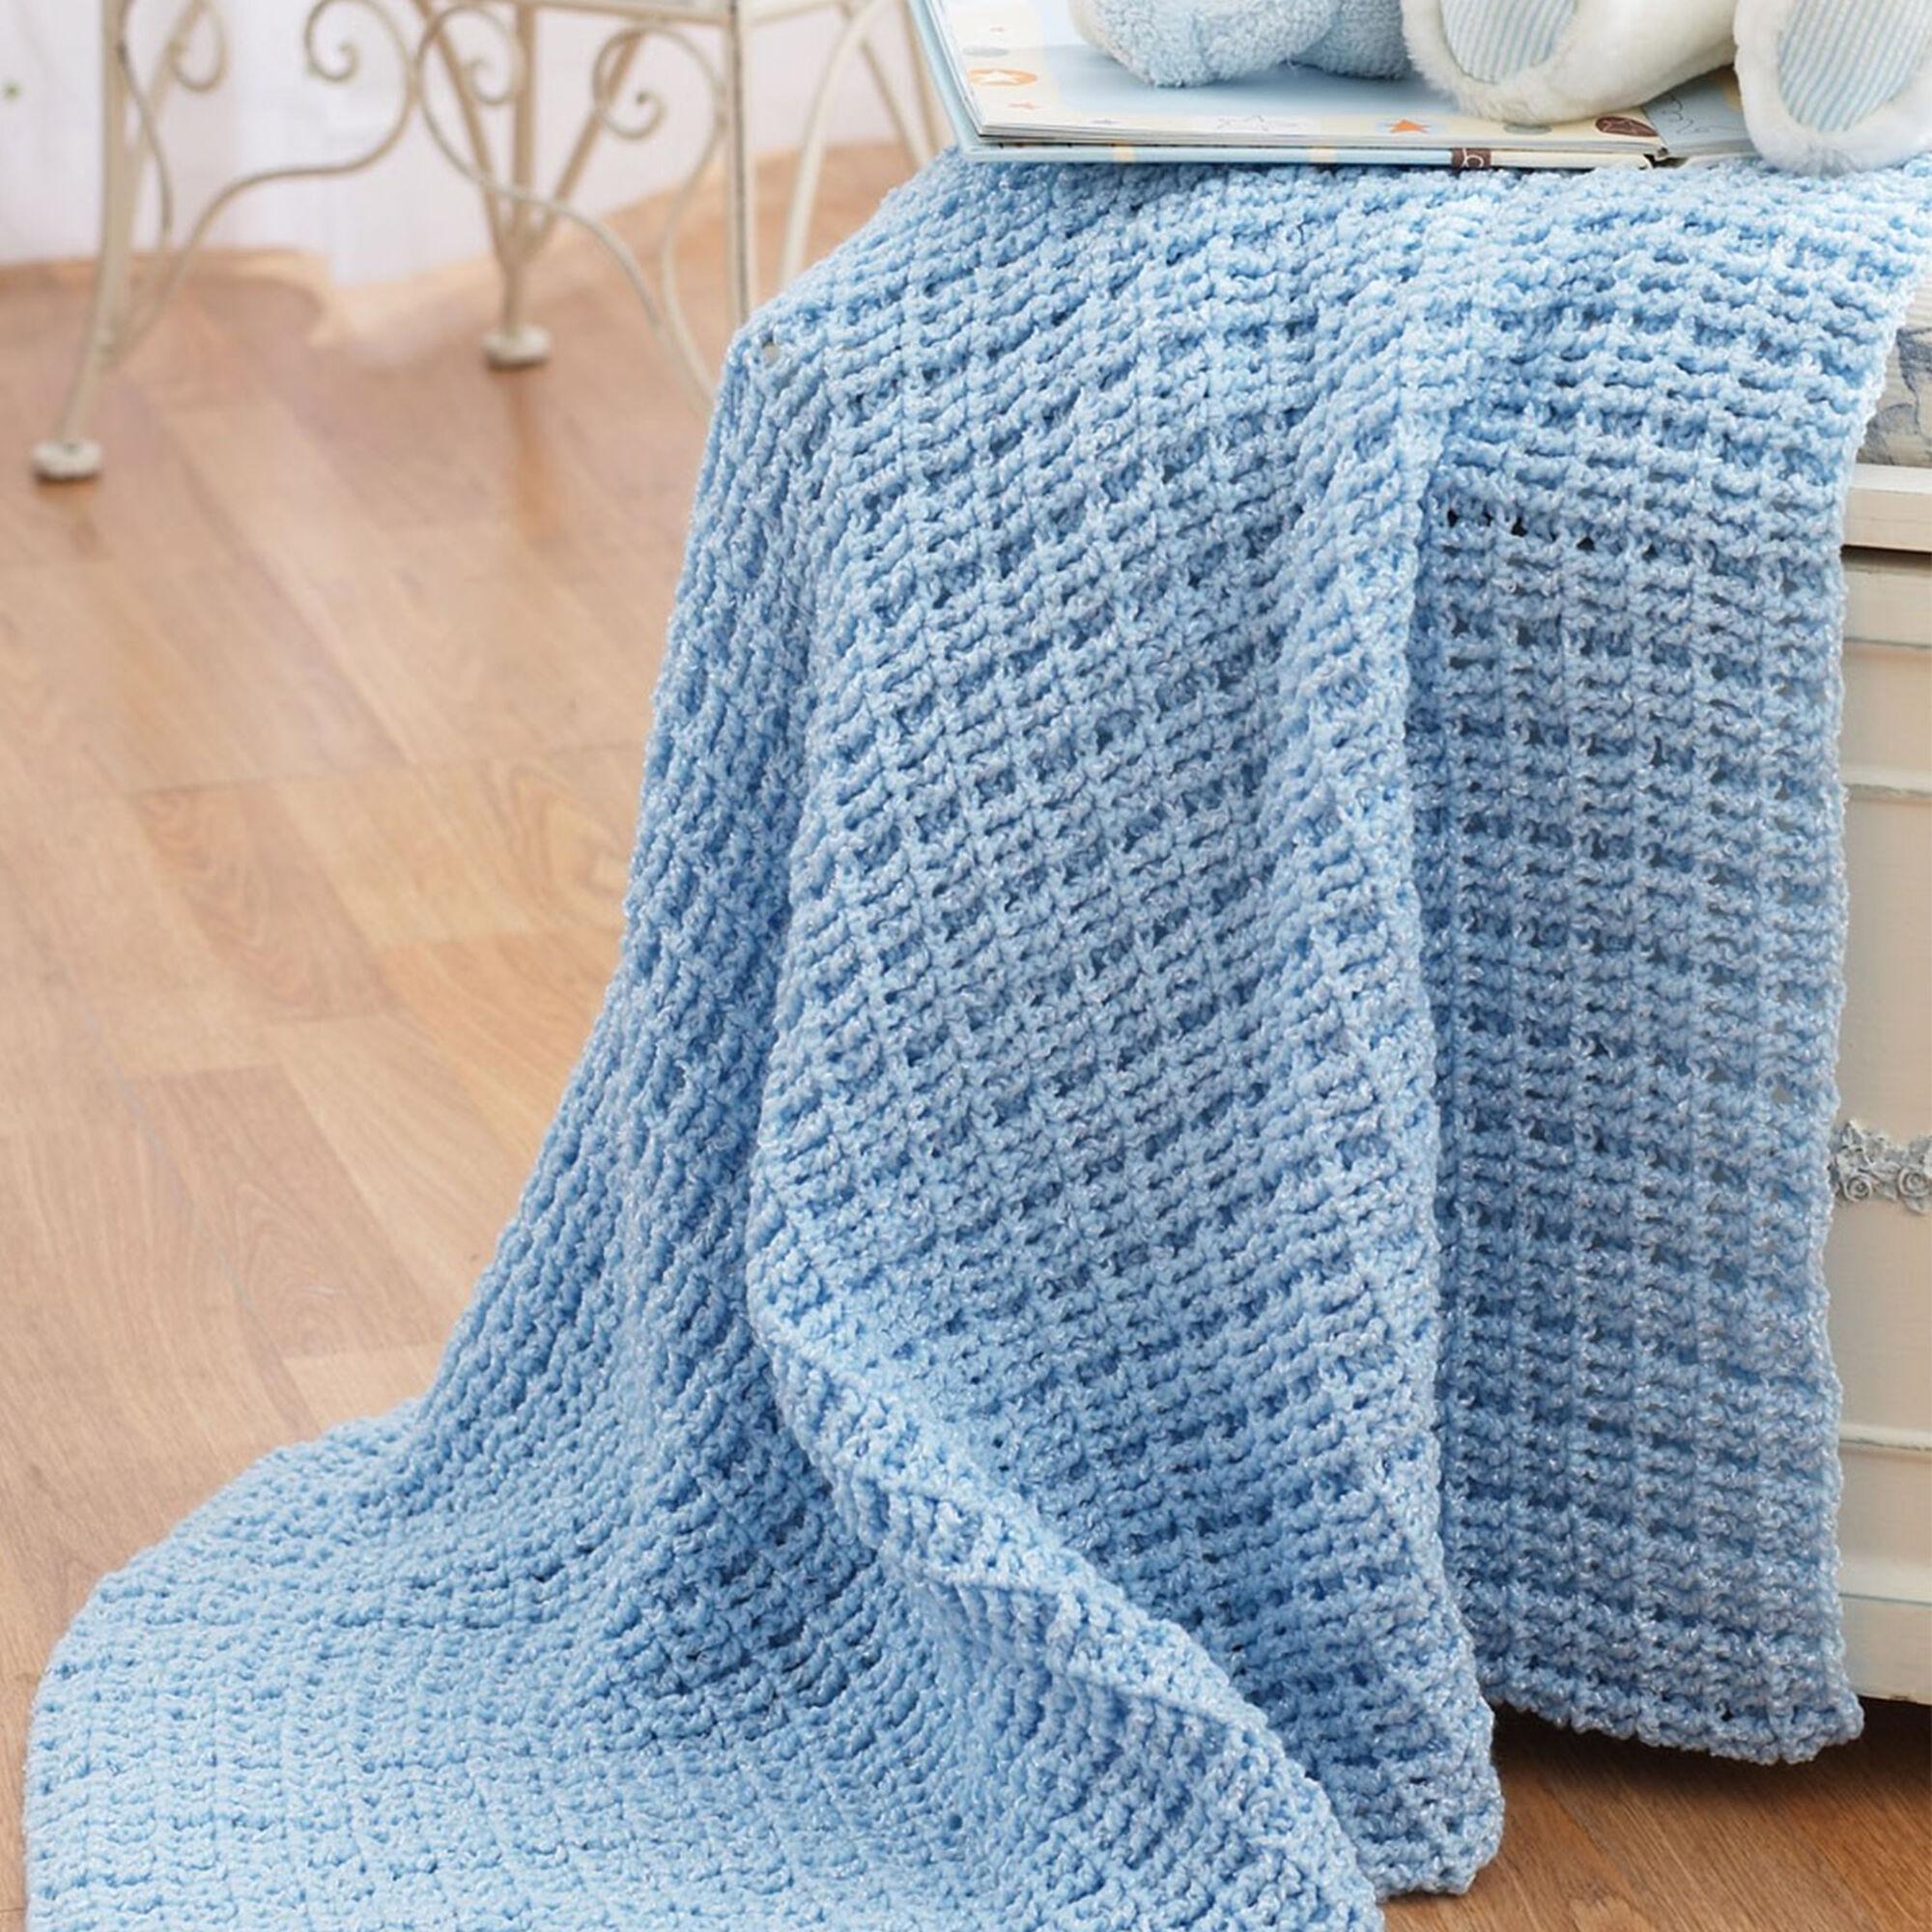 Bernat Crochet Baby Blanket | Yarnspirations